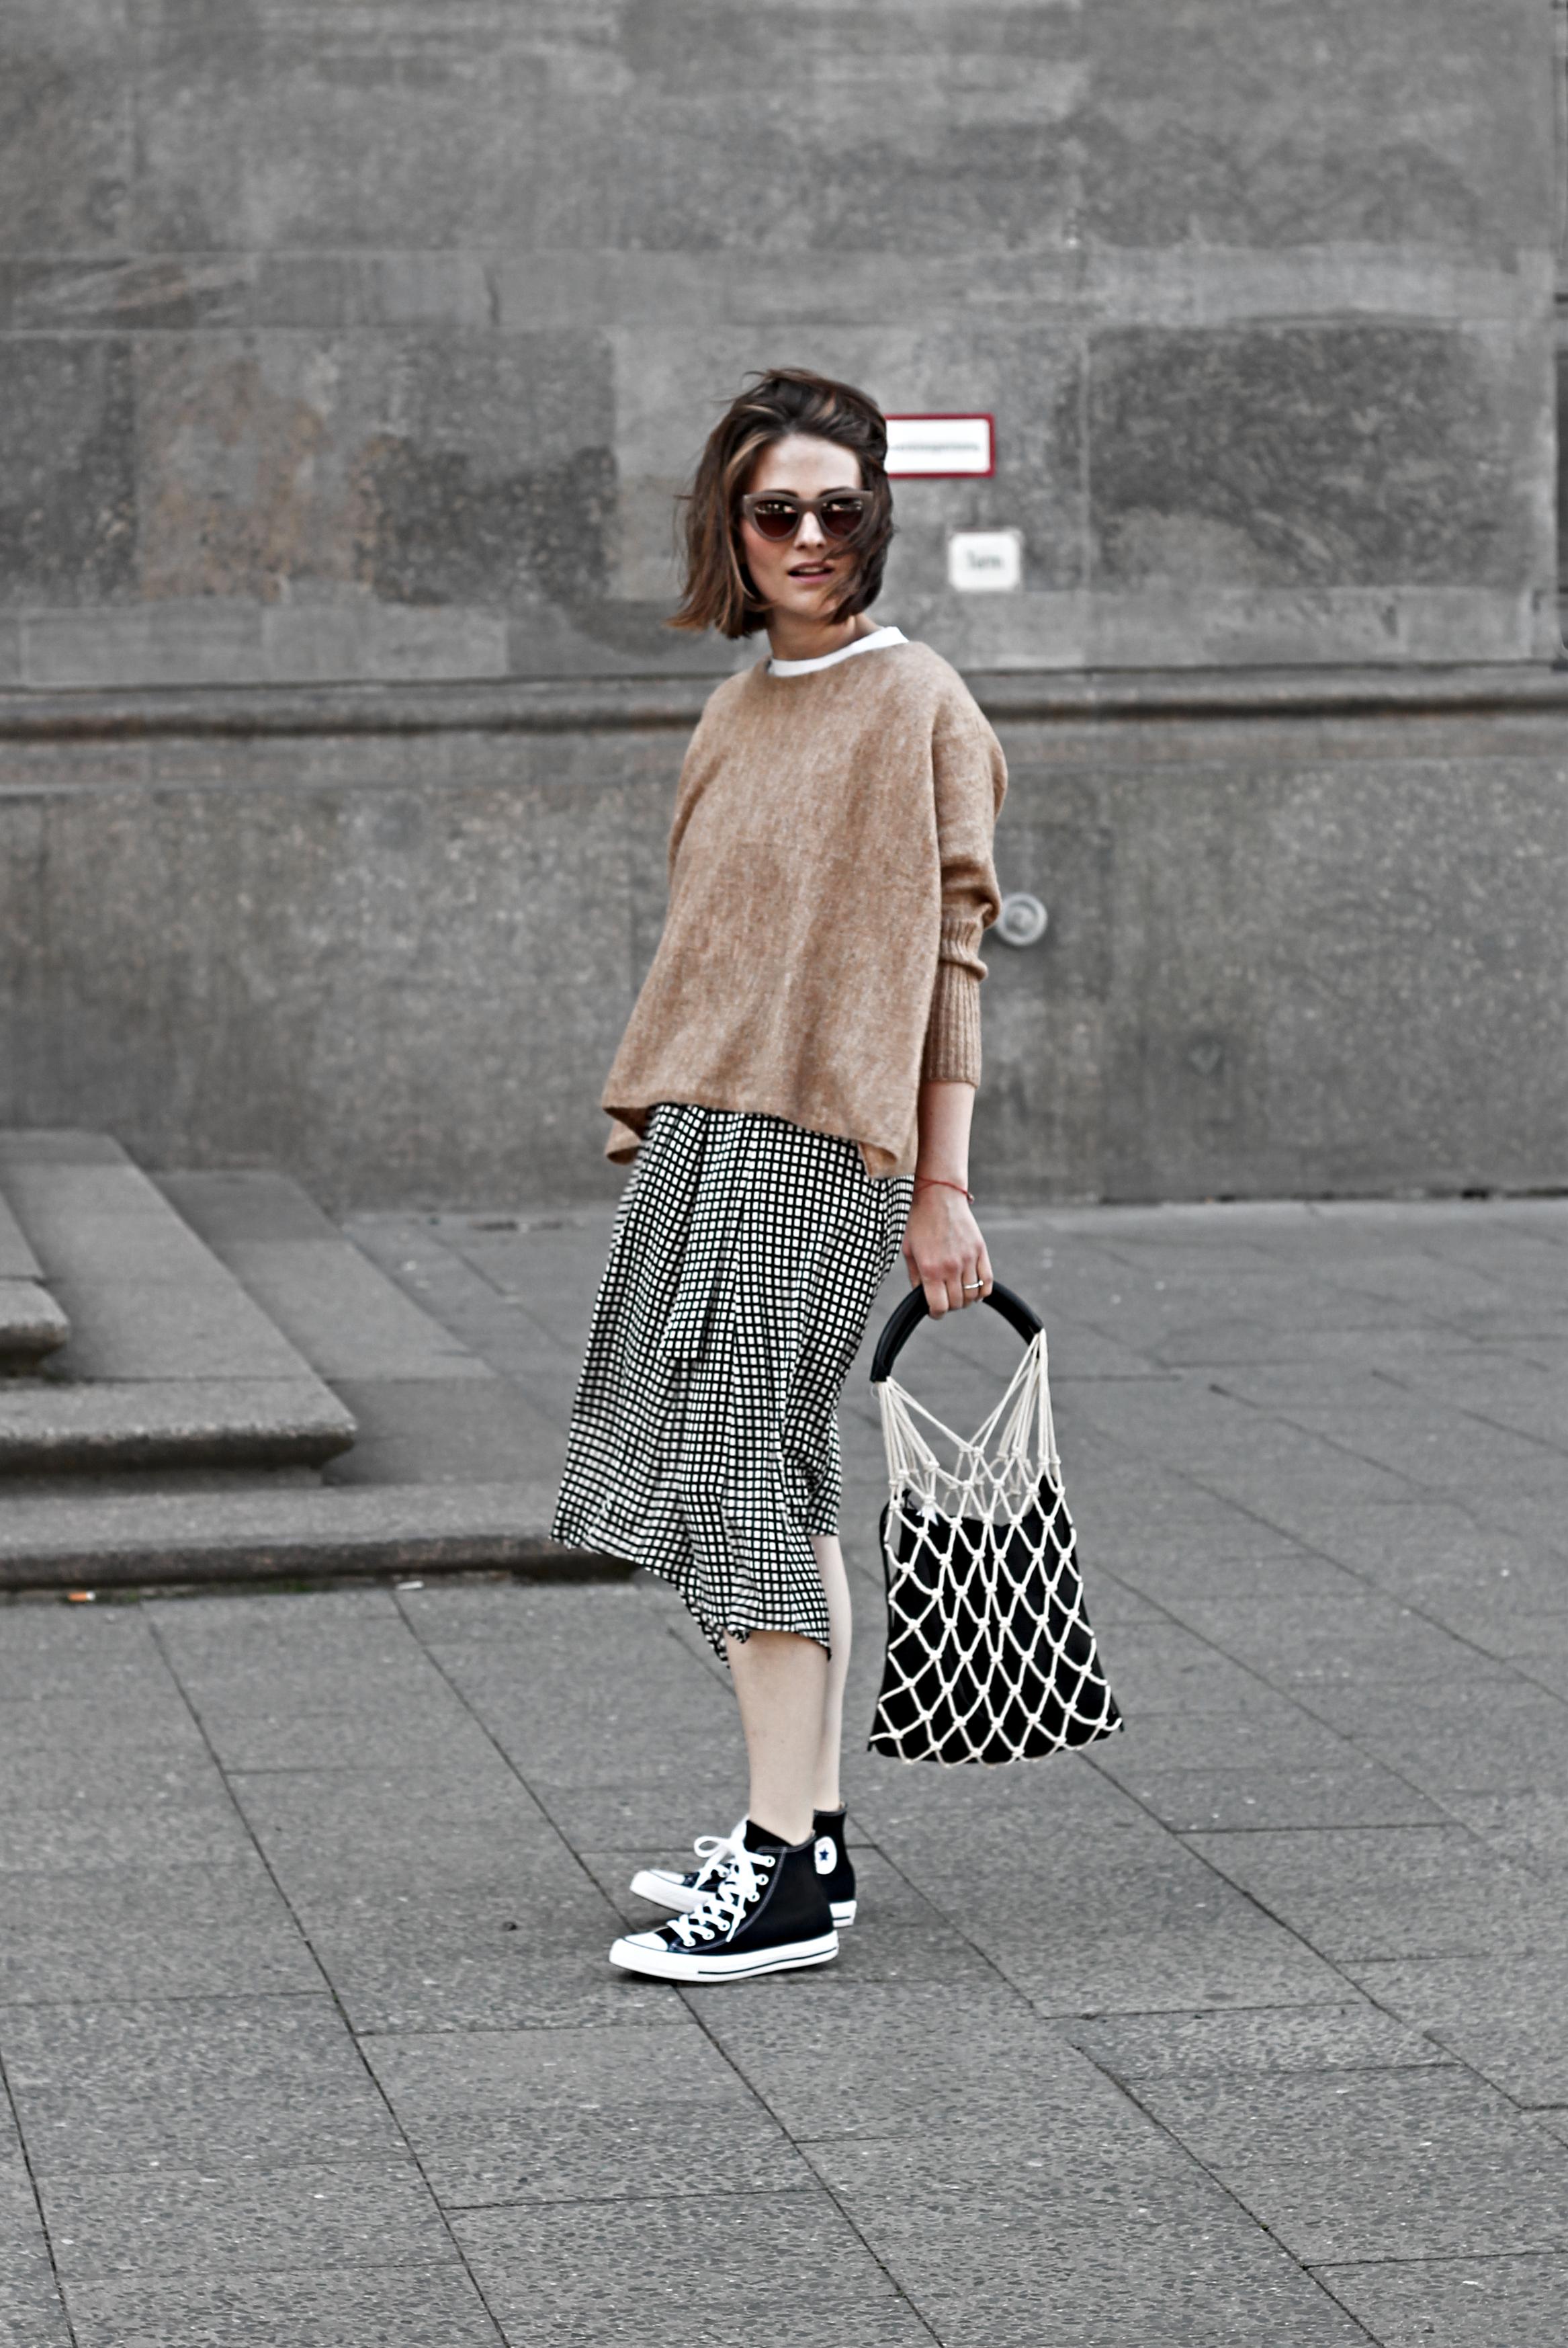 annaporter-fishnet-bag-camel-pullover-converse-high-sneakers-komono-sunglasses-6